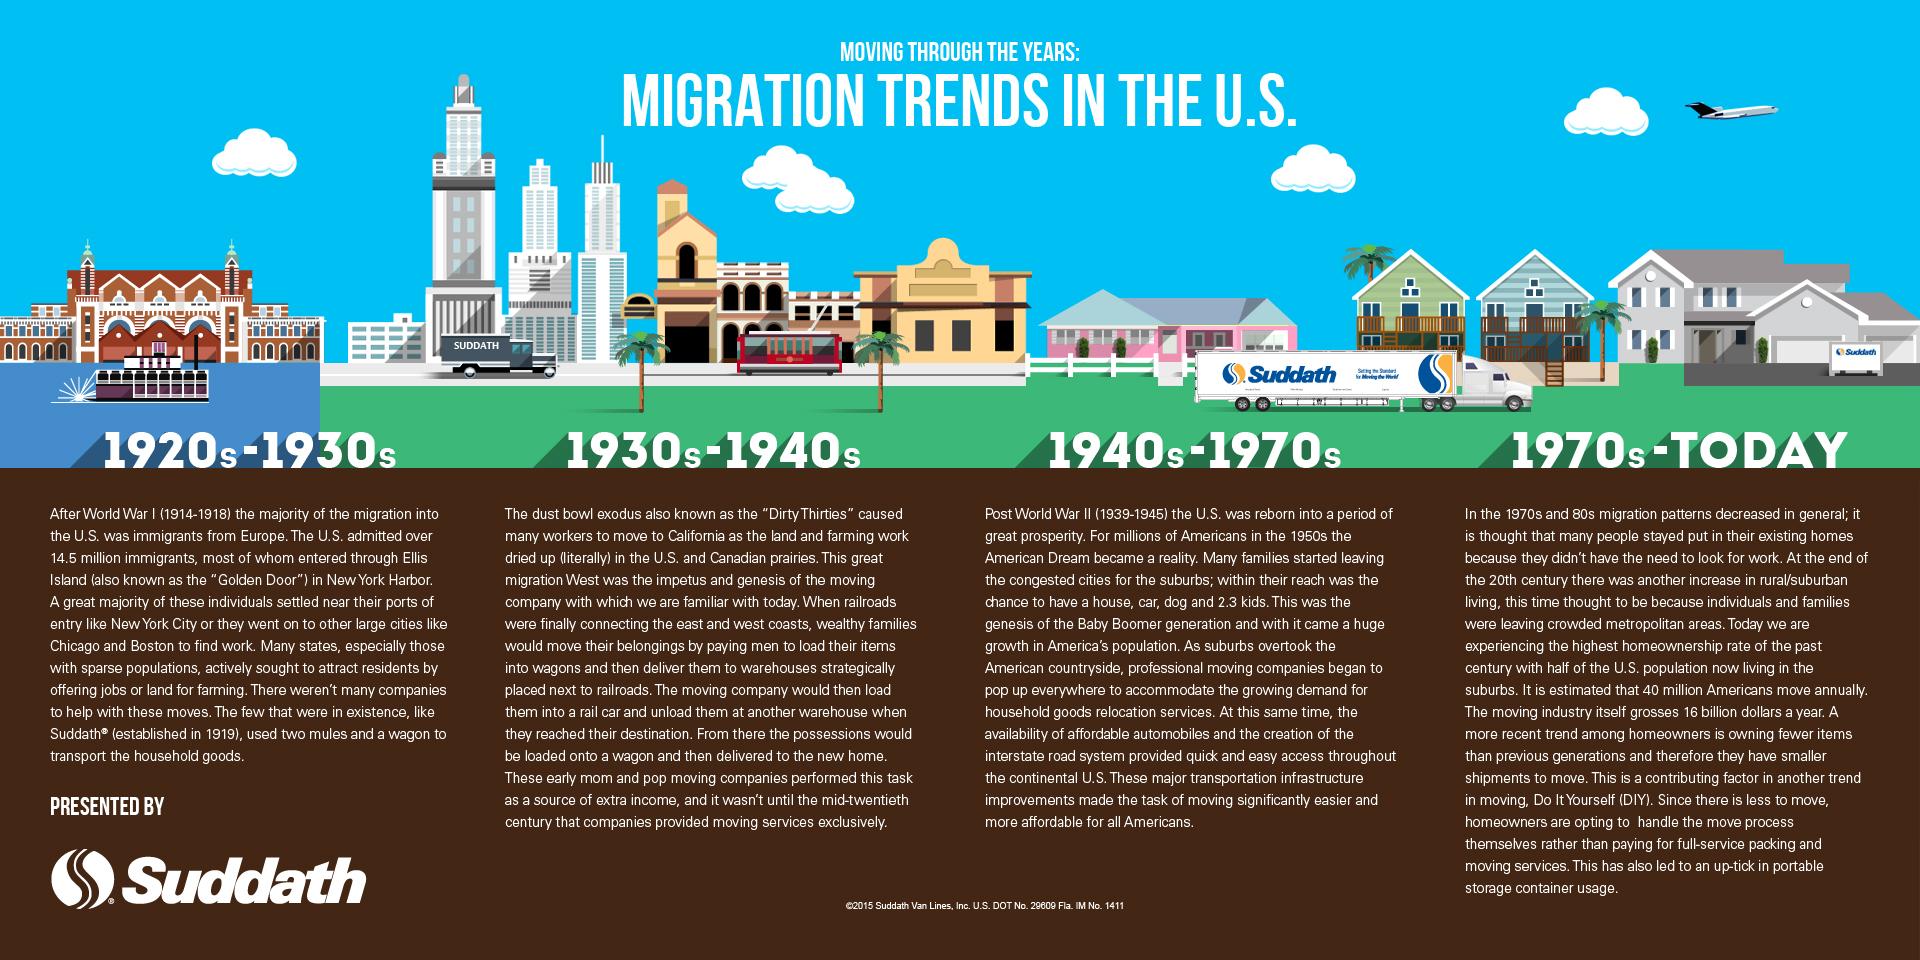 Migration Trends in the U.S.